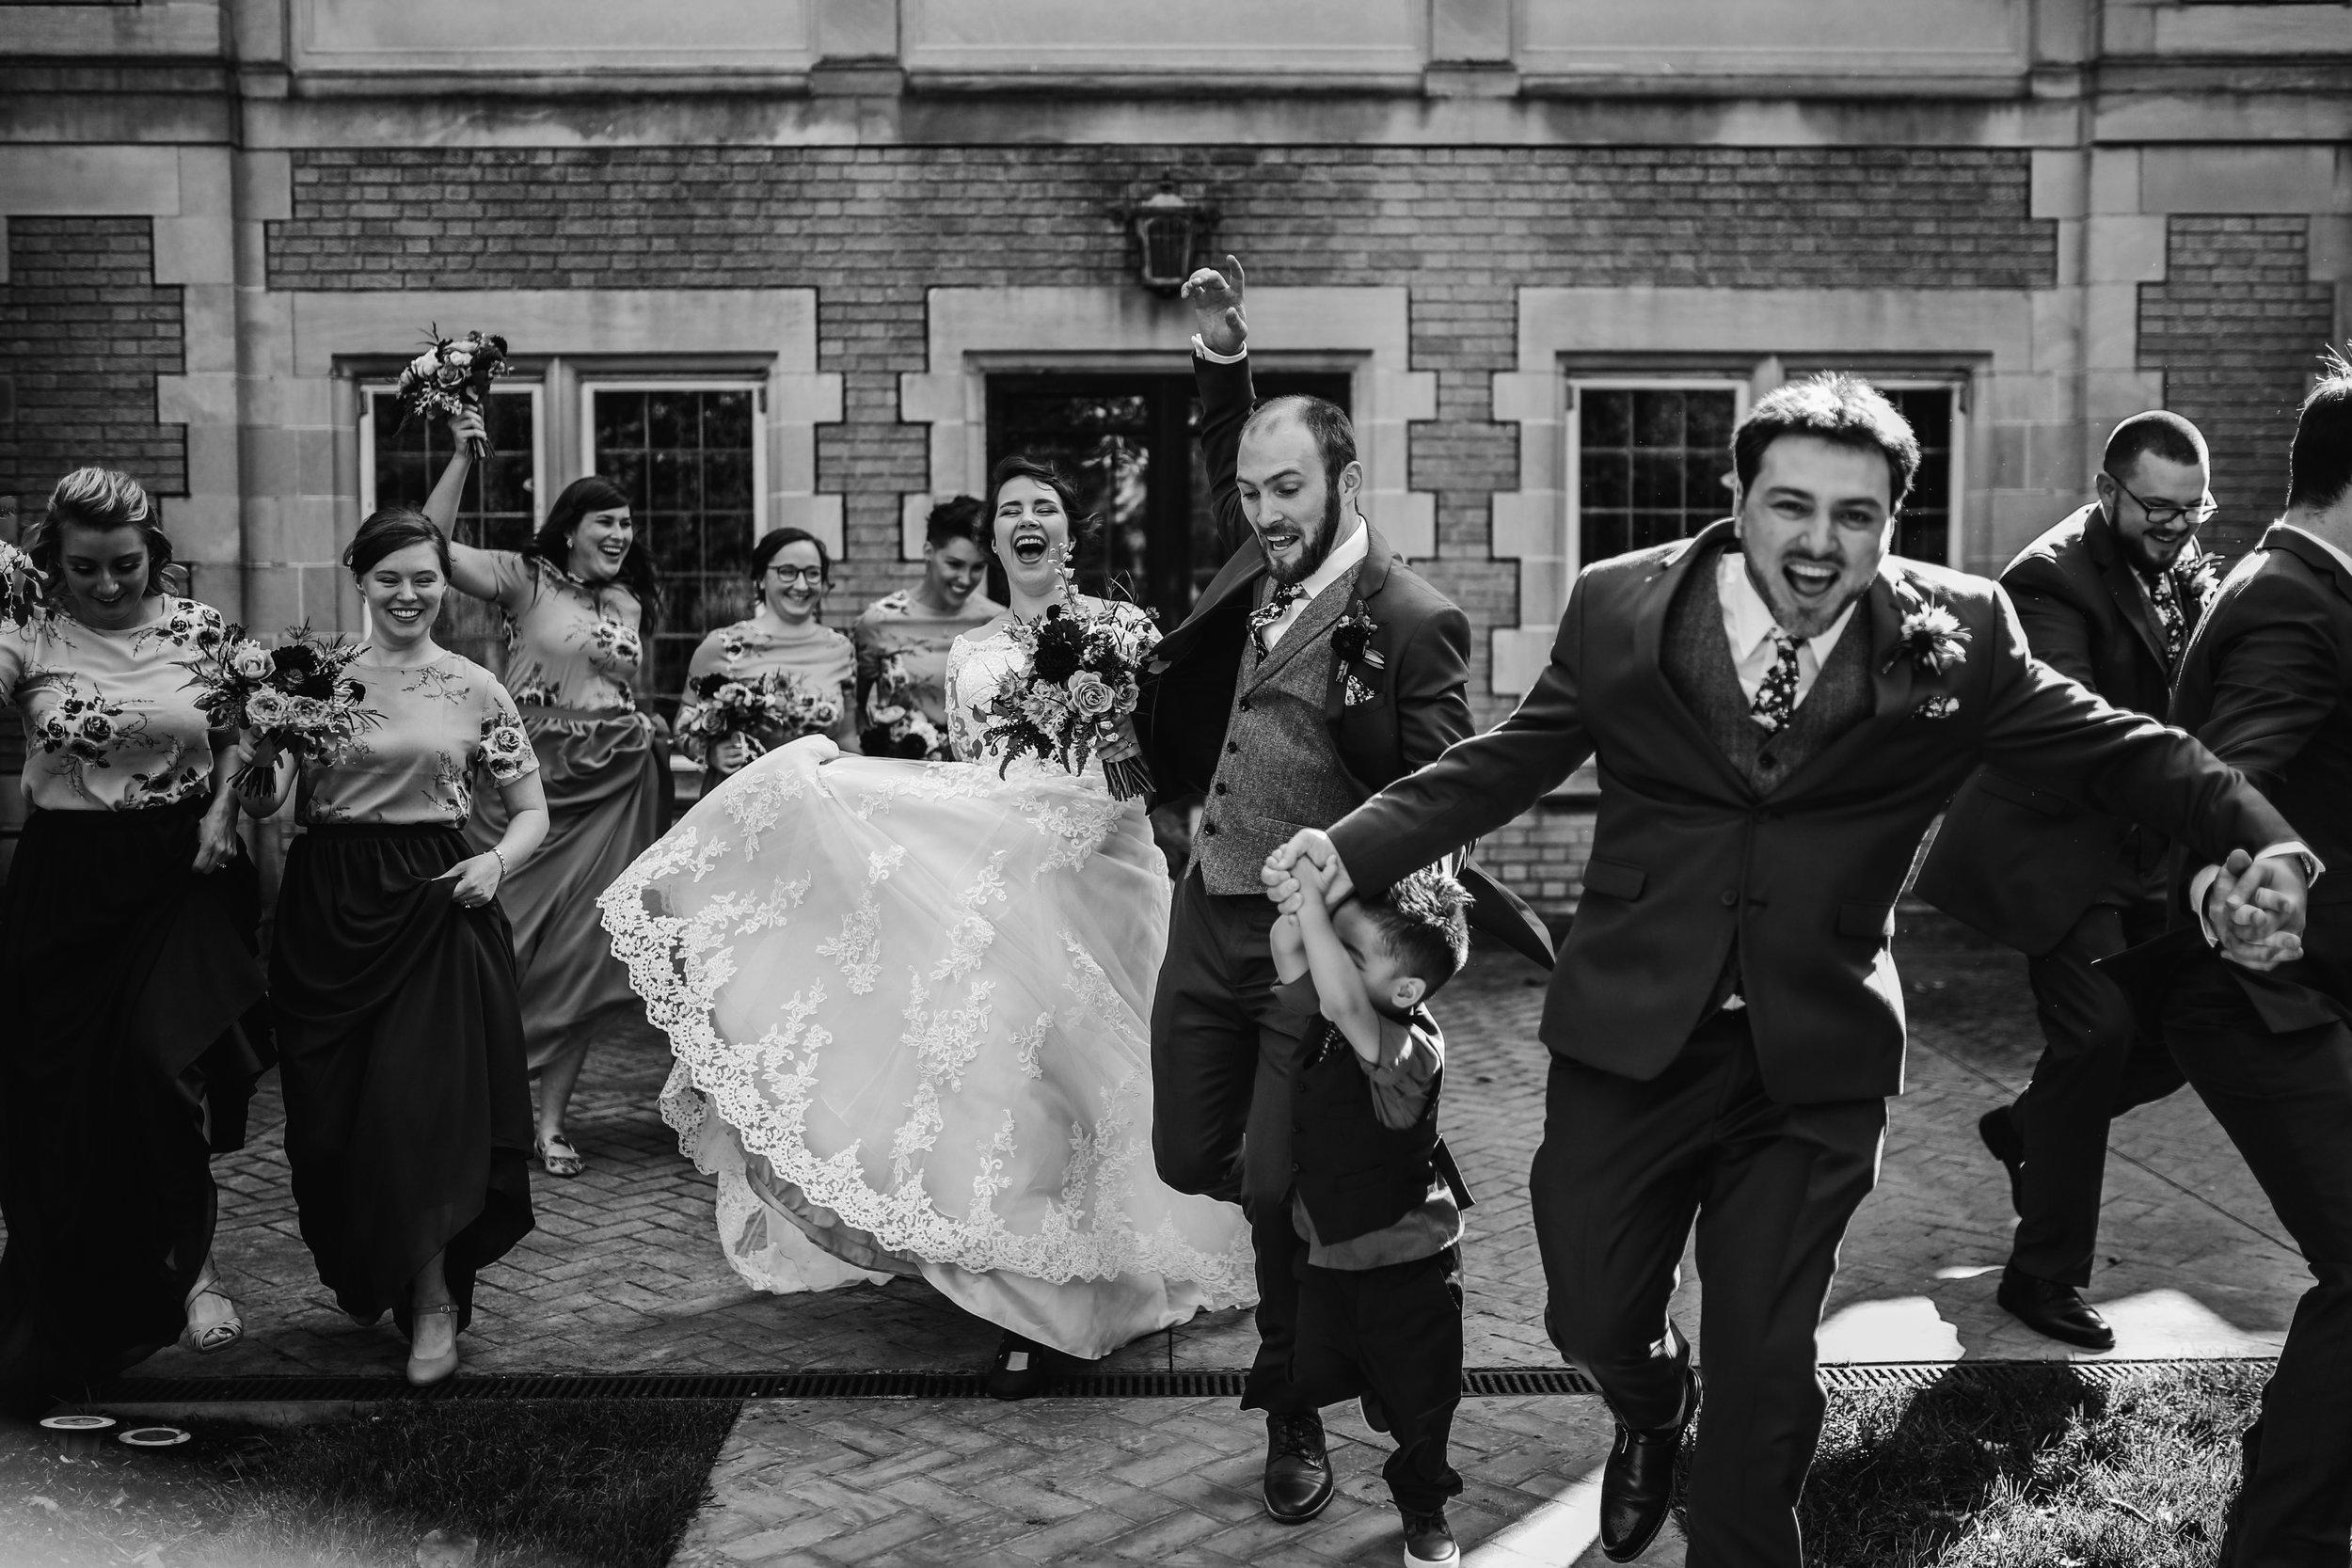 LDP_McNeiveWedding_WeddingParty_082.JPG